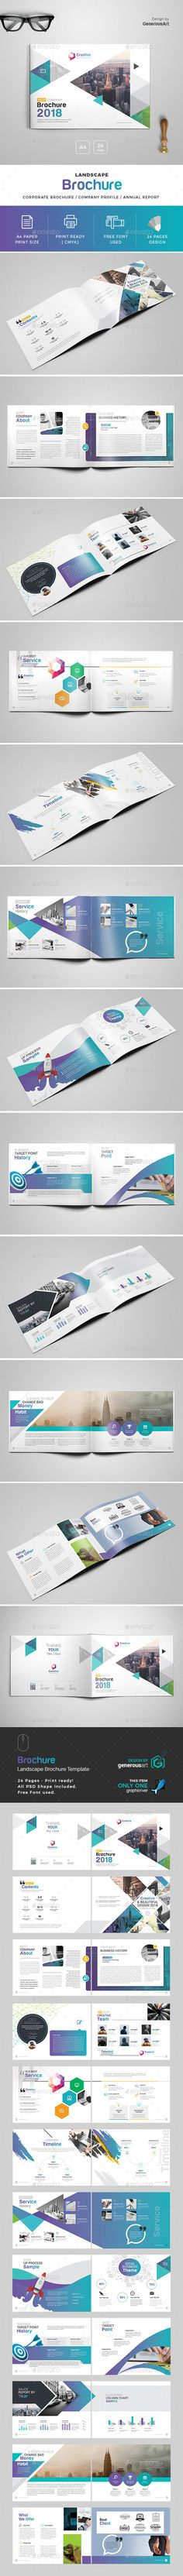 Company Profile Landscape Brochure Template Company profile - landscape brochure